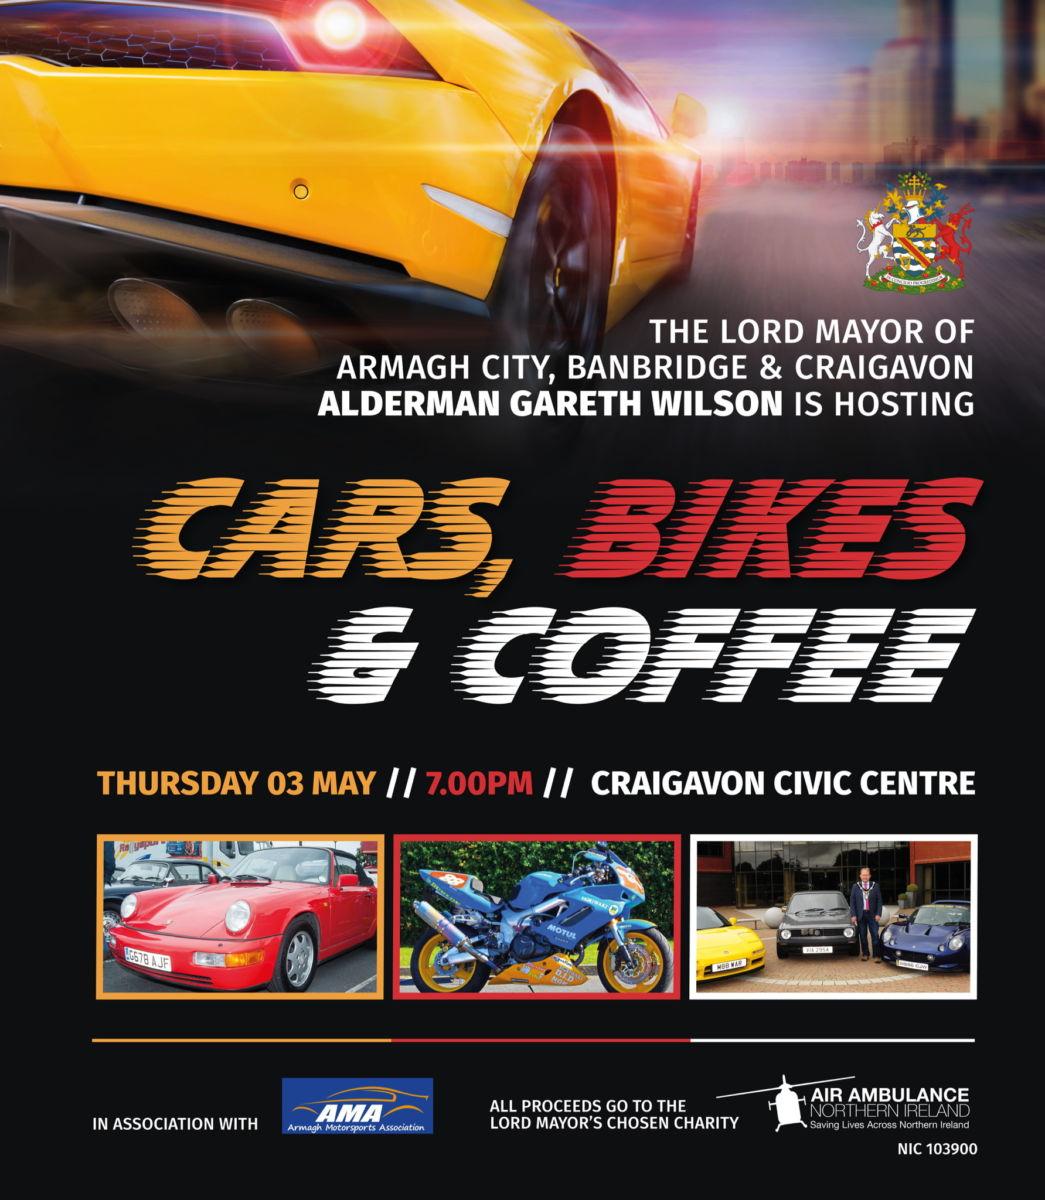 Cars, Bikes and Coffee, Craigavon